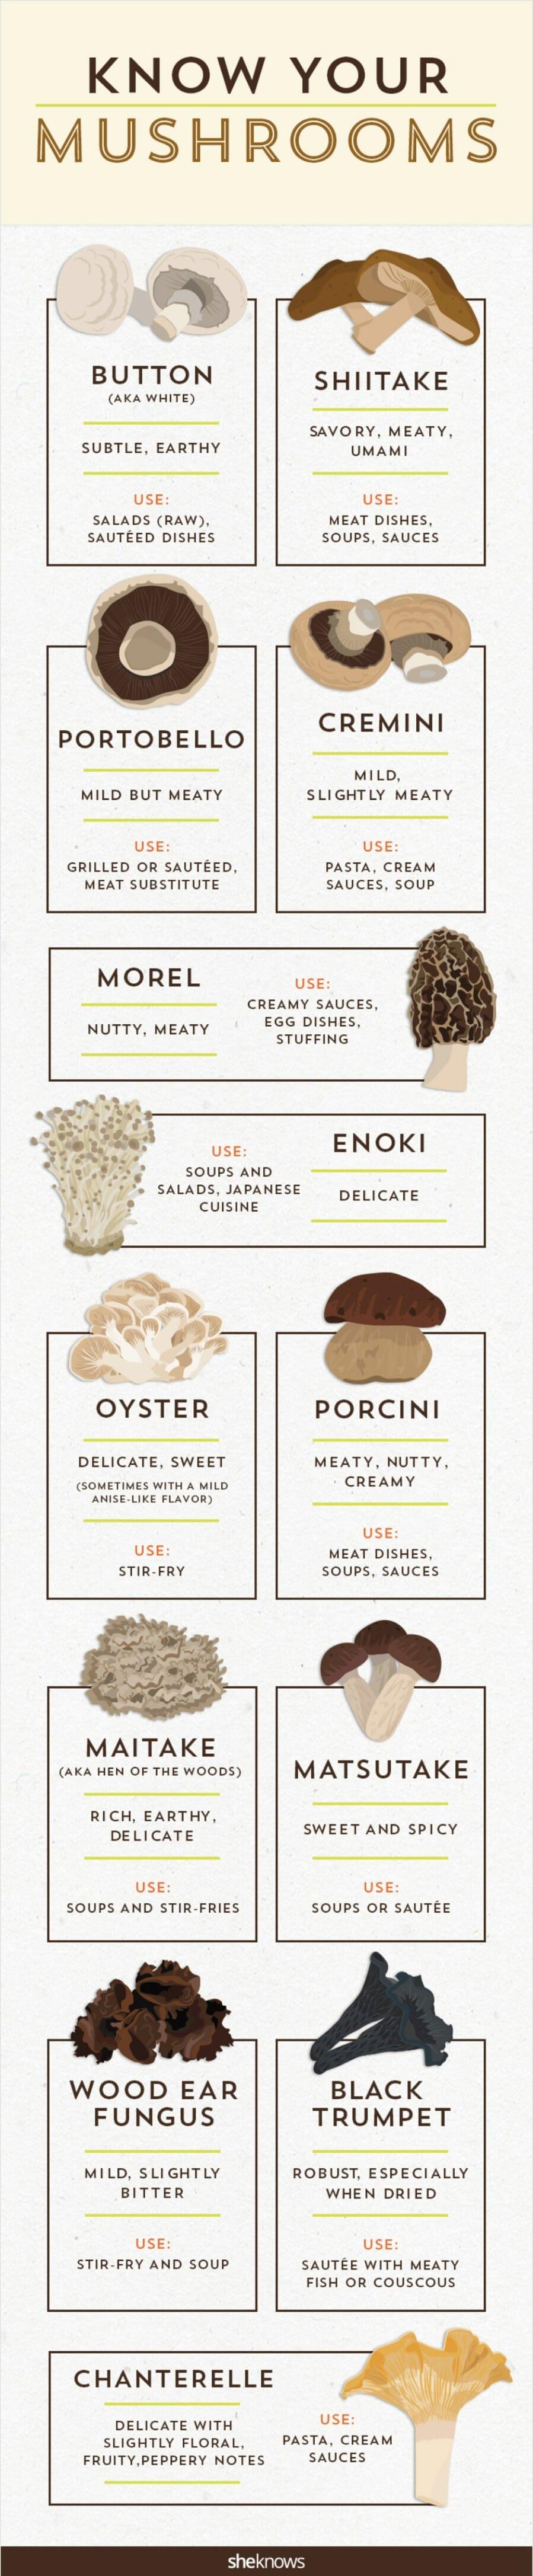 Know your mushroom taxonomy.